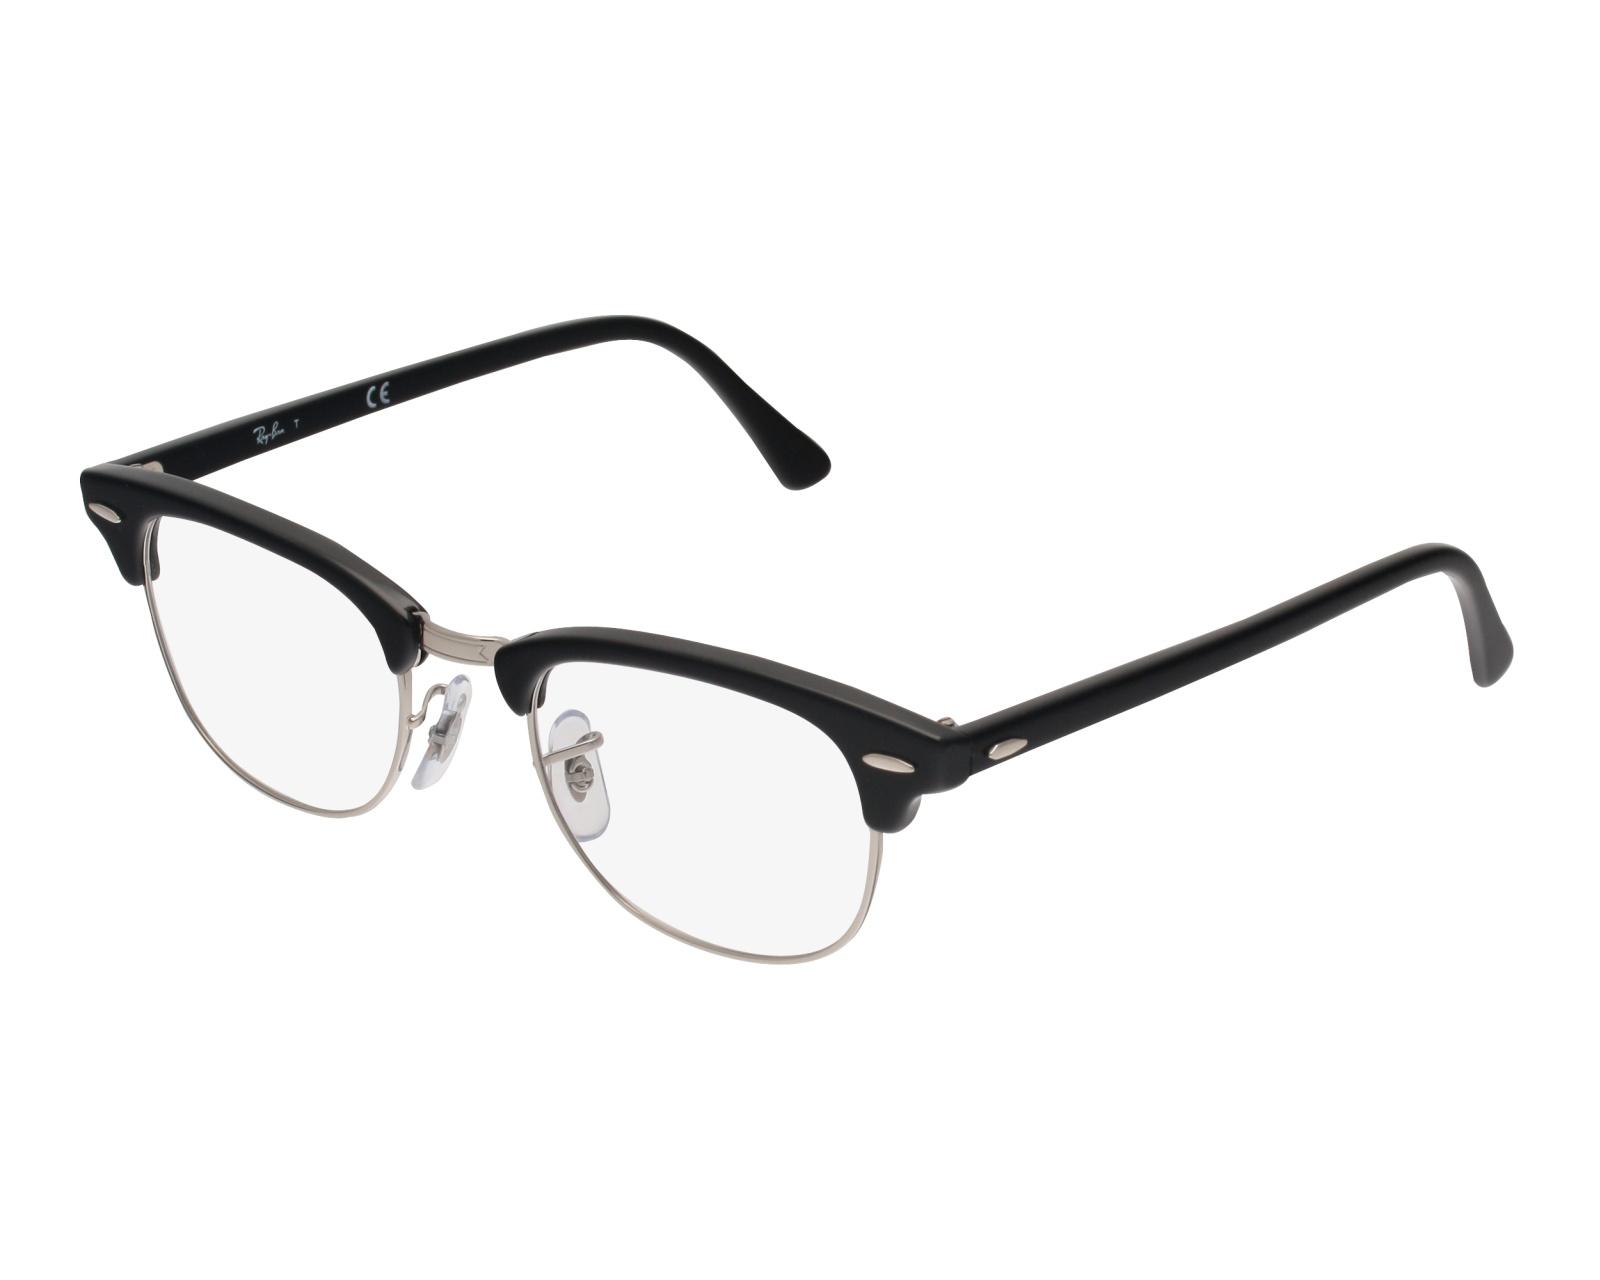 c52dfdff5eb eyeglasses Ray-Ban RX-5154 2000 49-21 Black Silver front view